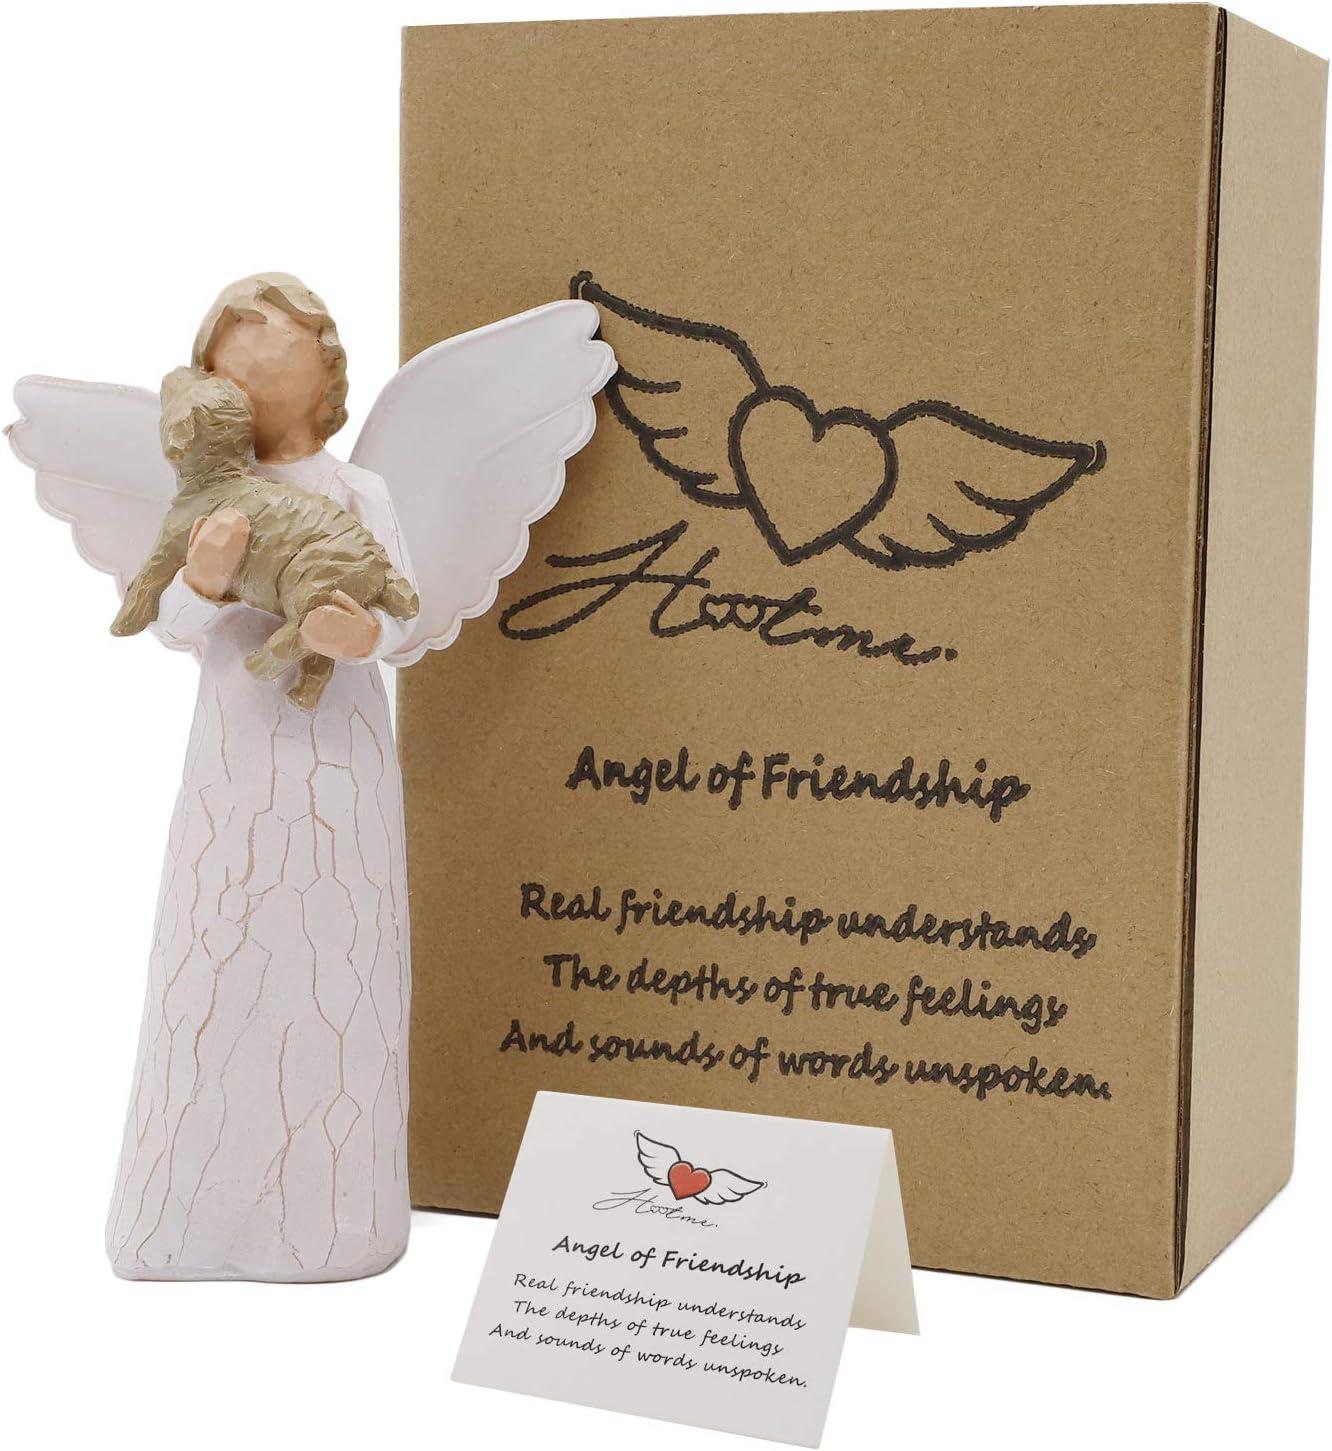 Guardian Angel Figurine, Angel of Friendship - Hand Carved Praying Angel Sculpture, Encouragement Present, Home Decoration Gift toShow Love, Sympathy, Gratitude, Bereavement, Friendship or Prayer